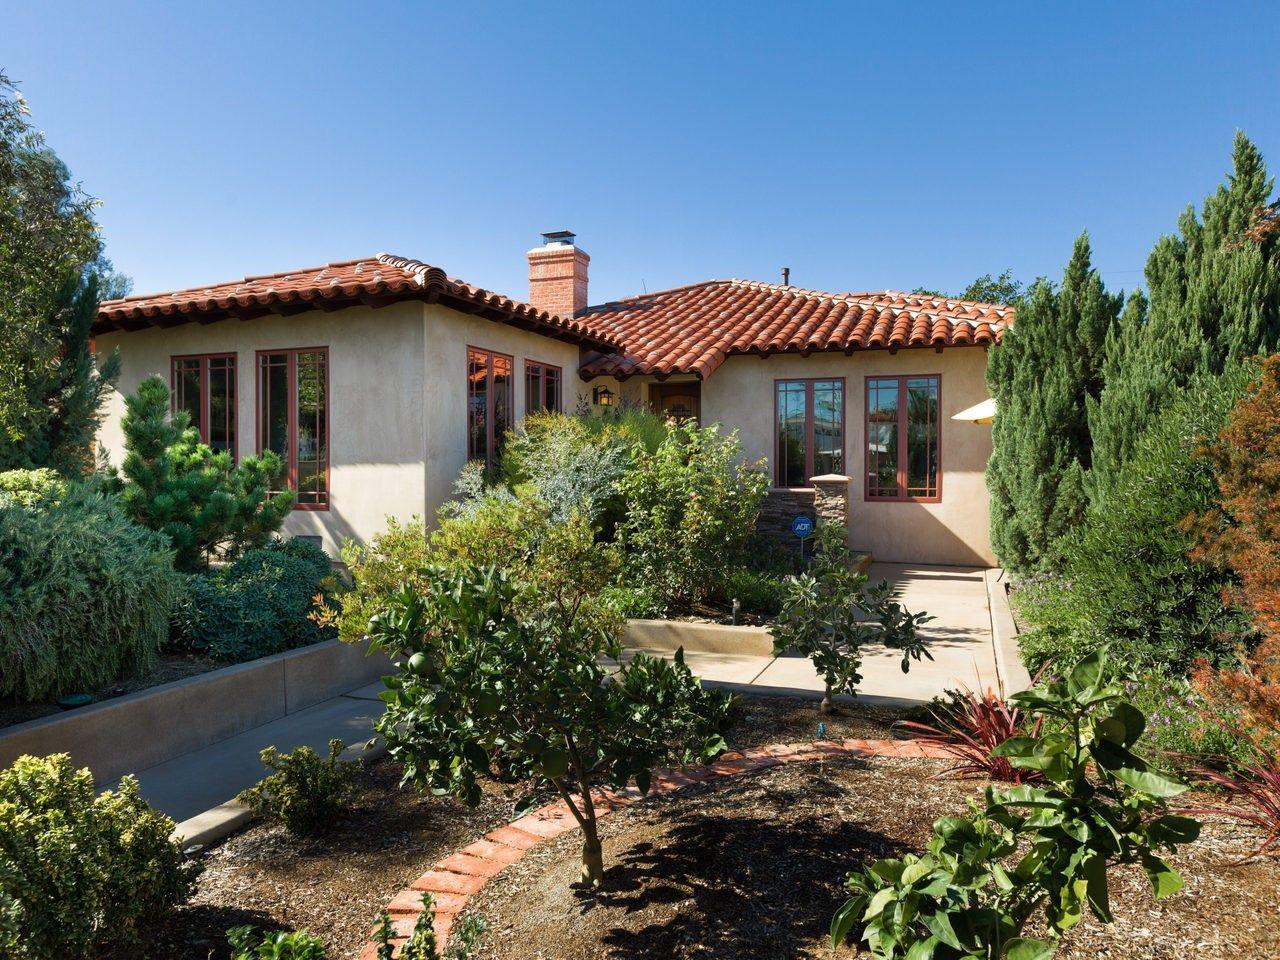 Main Photo: House for sale : 3 bedrooms : 250 I Avenue in Coronado